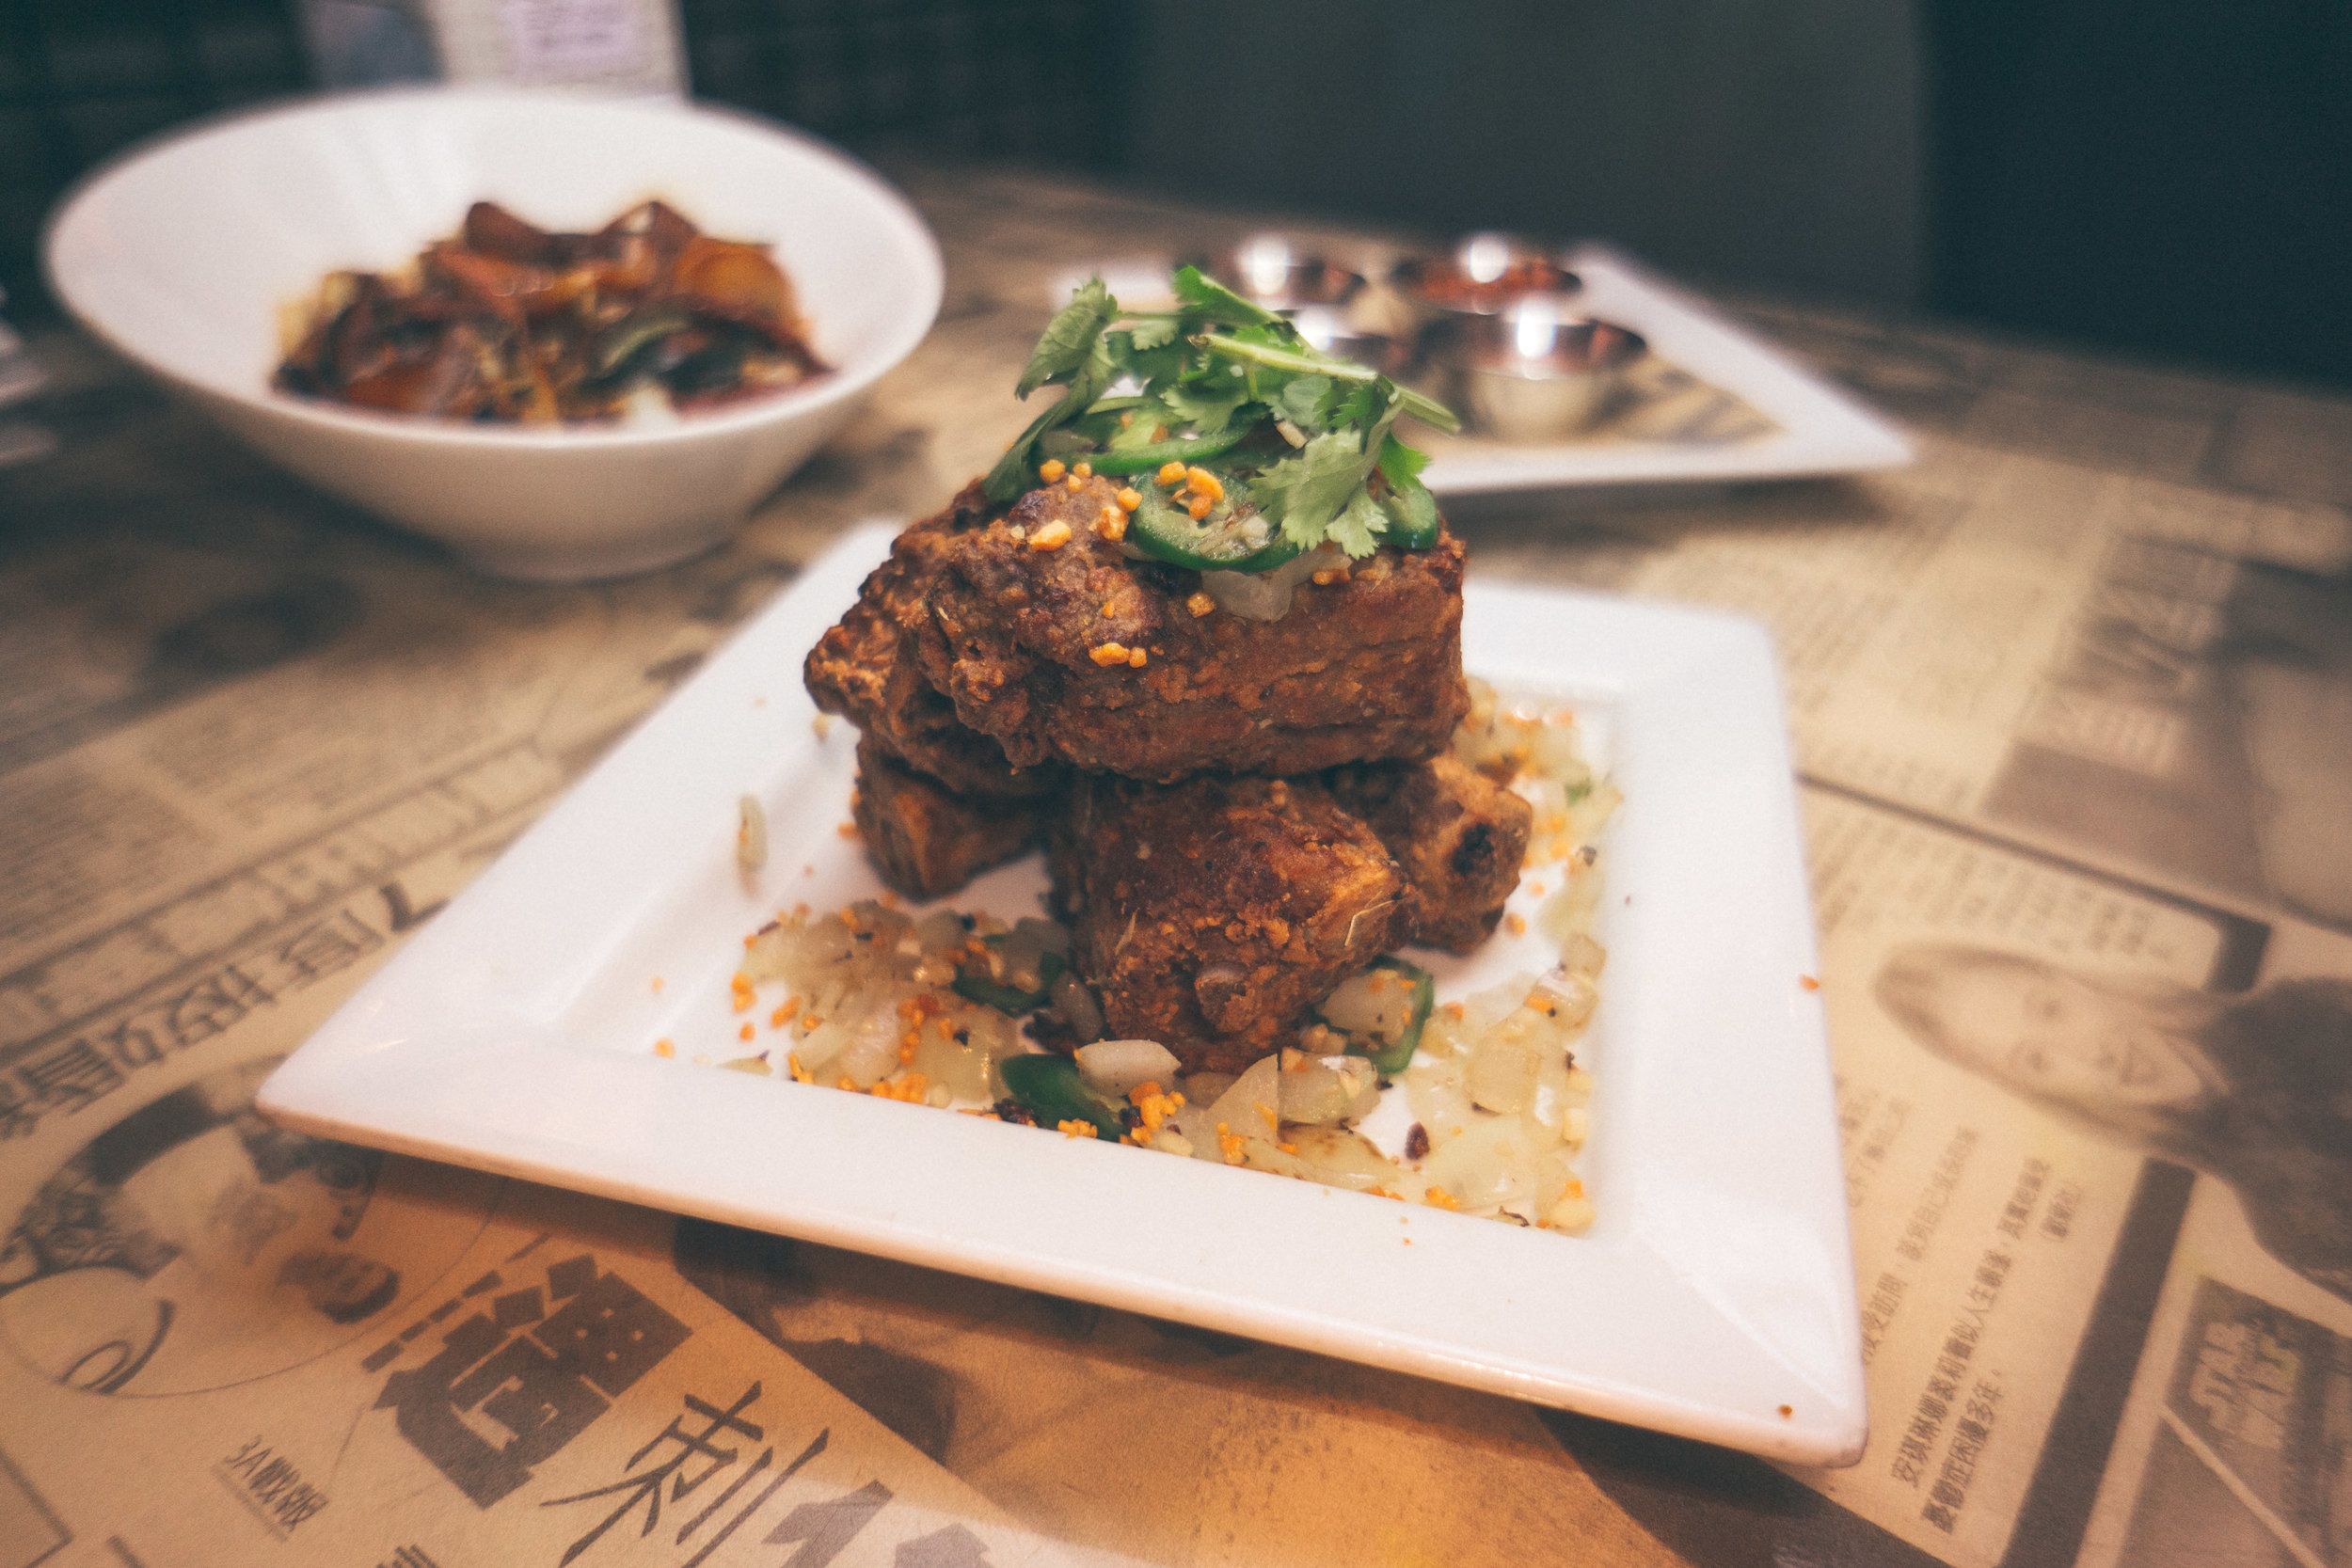 Salt-N-Pepa Ribs: Double-fried crispy pork riblets tossed in ginger, Serrano peppers, garlic & onions